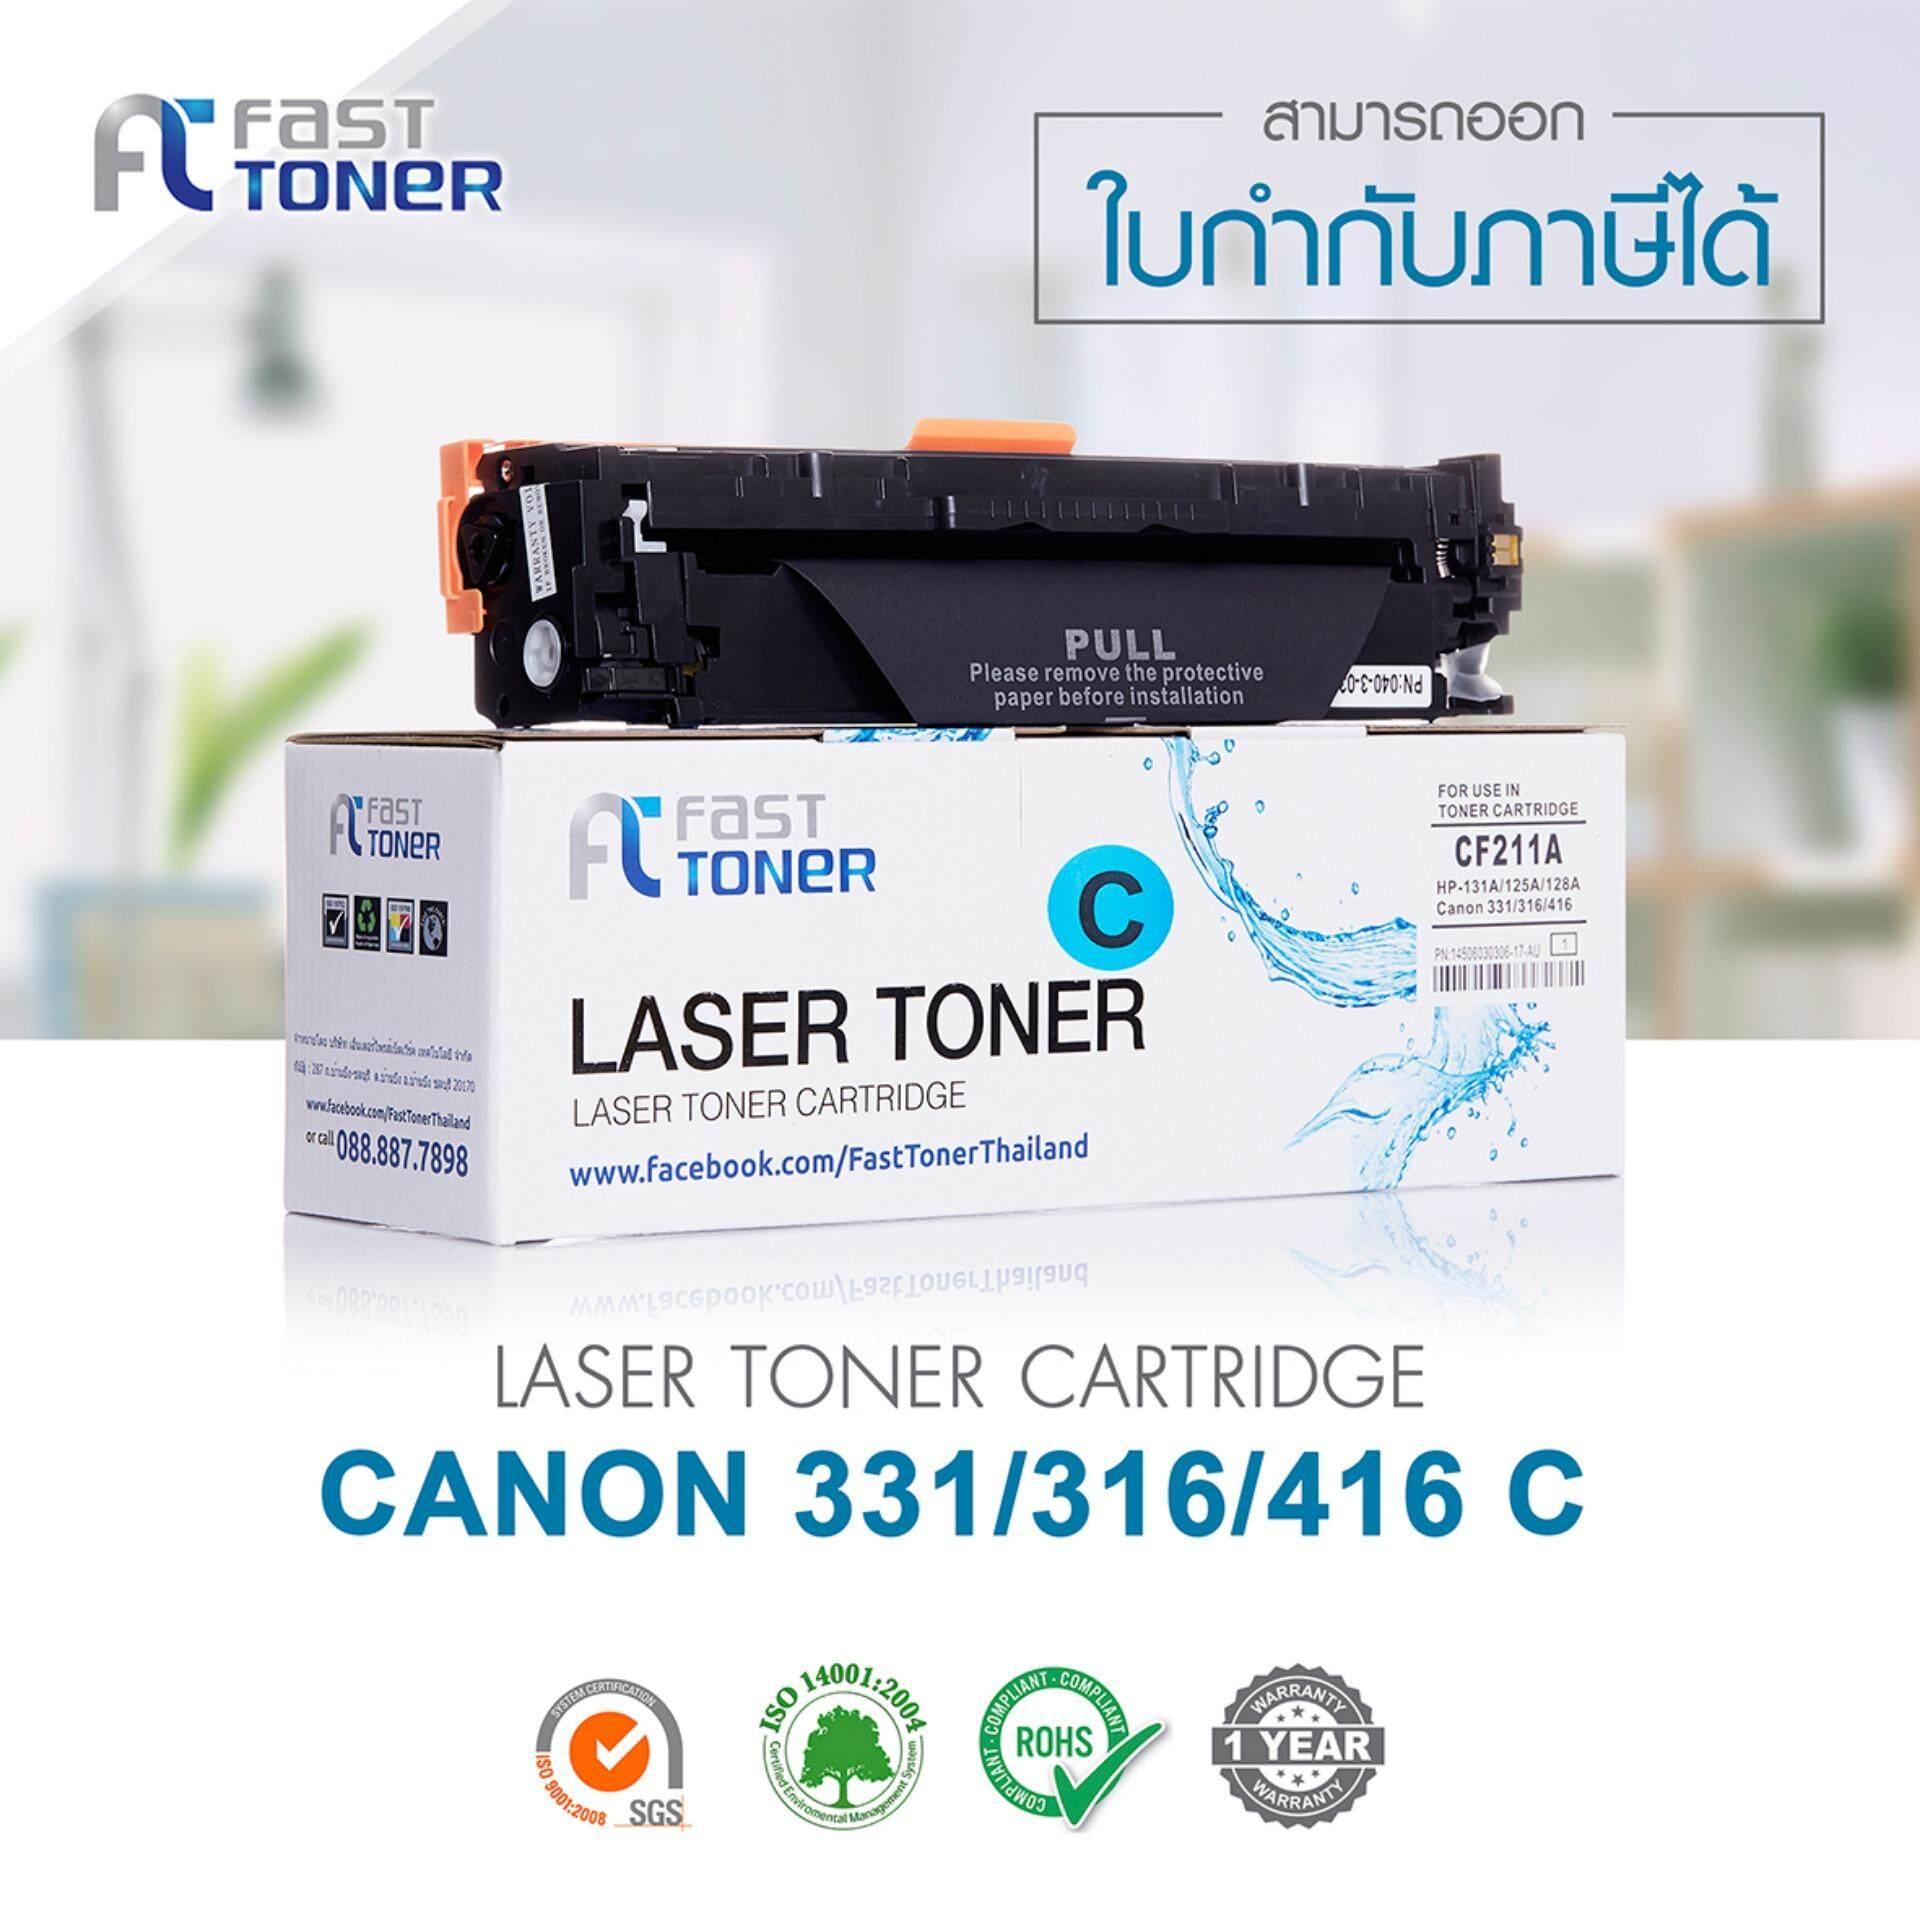 Fast Toner ตลับหมึกพิมพ์เลเซอร์ Canon Cartridge 331/316/416 (Cyan)